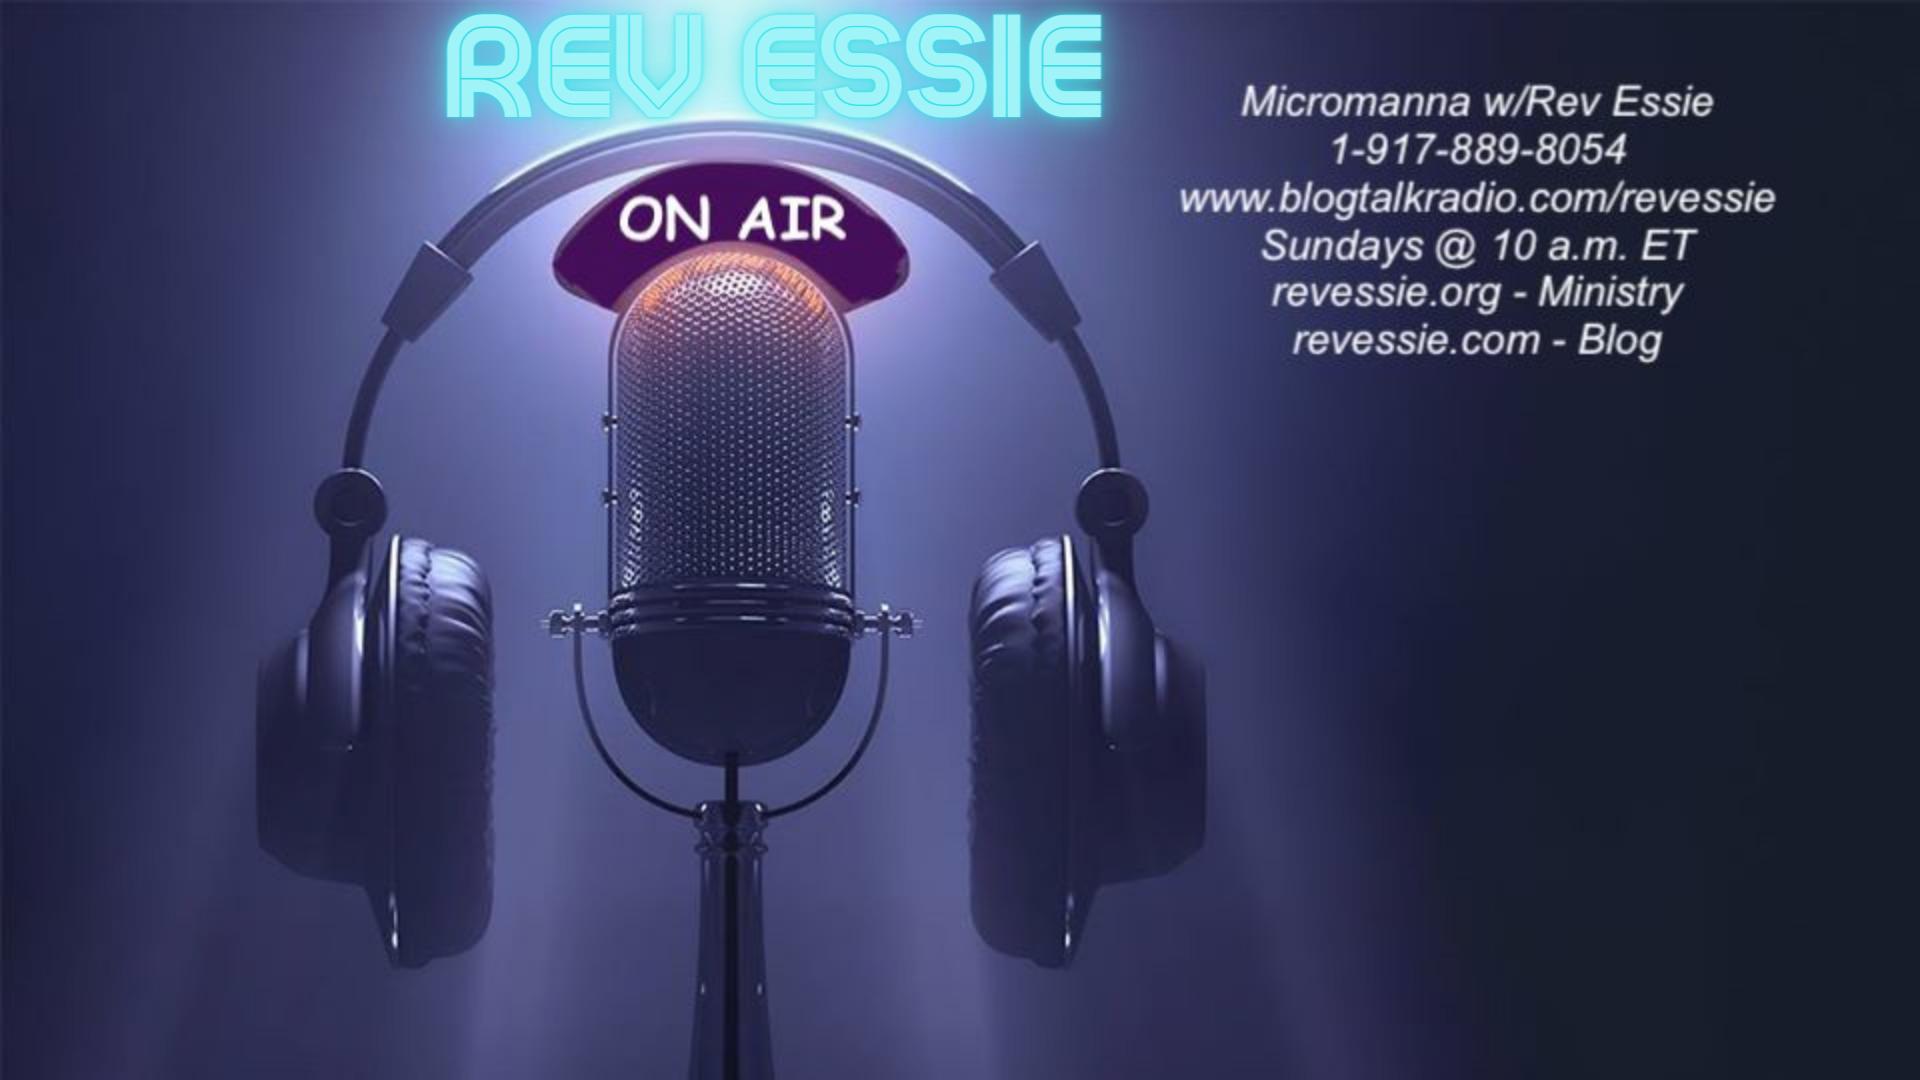 rev-essie-on-air-4.1221